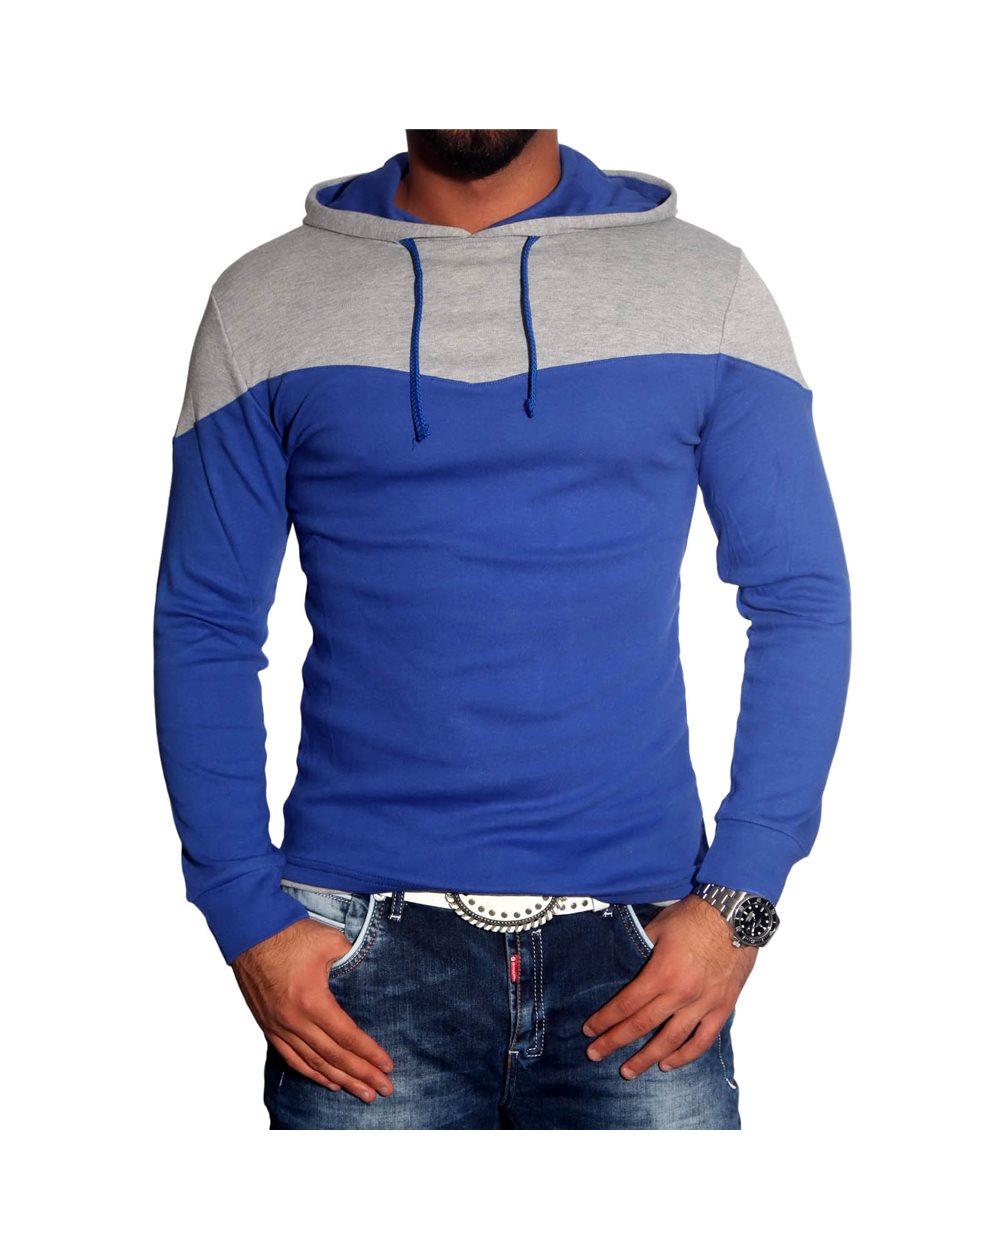 Subliminal Mode - Tee shirt homme manches longues col à cacpuche pull leger SBV0712